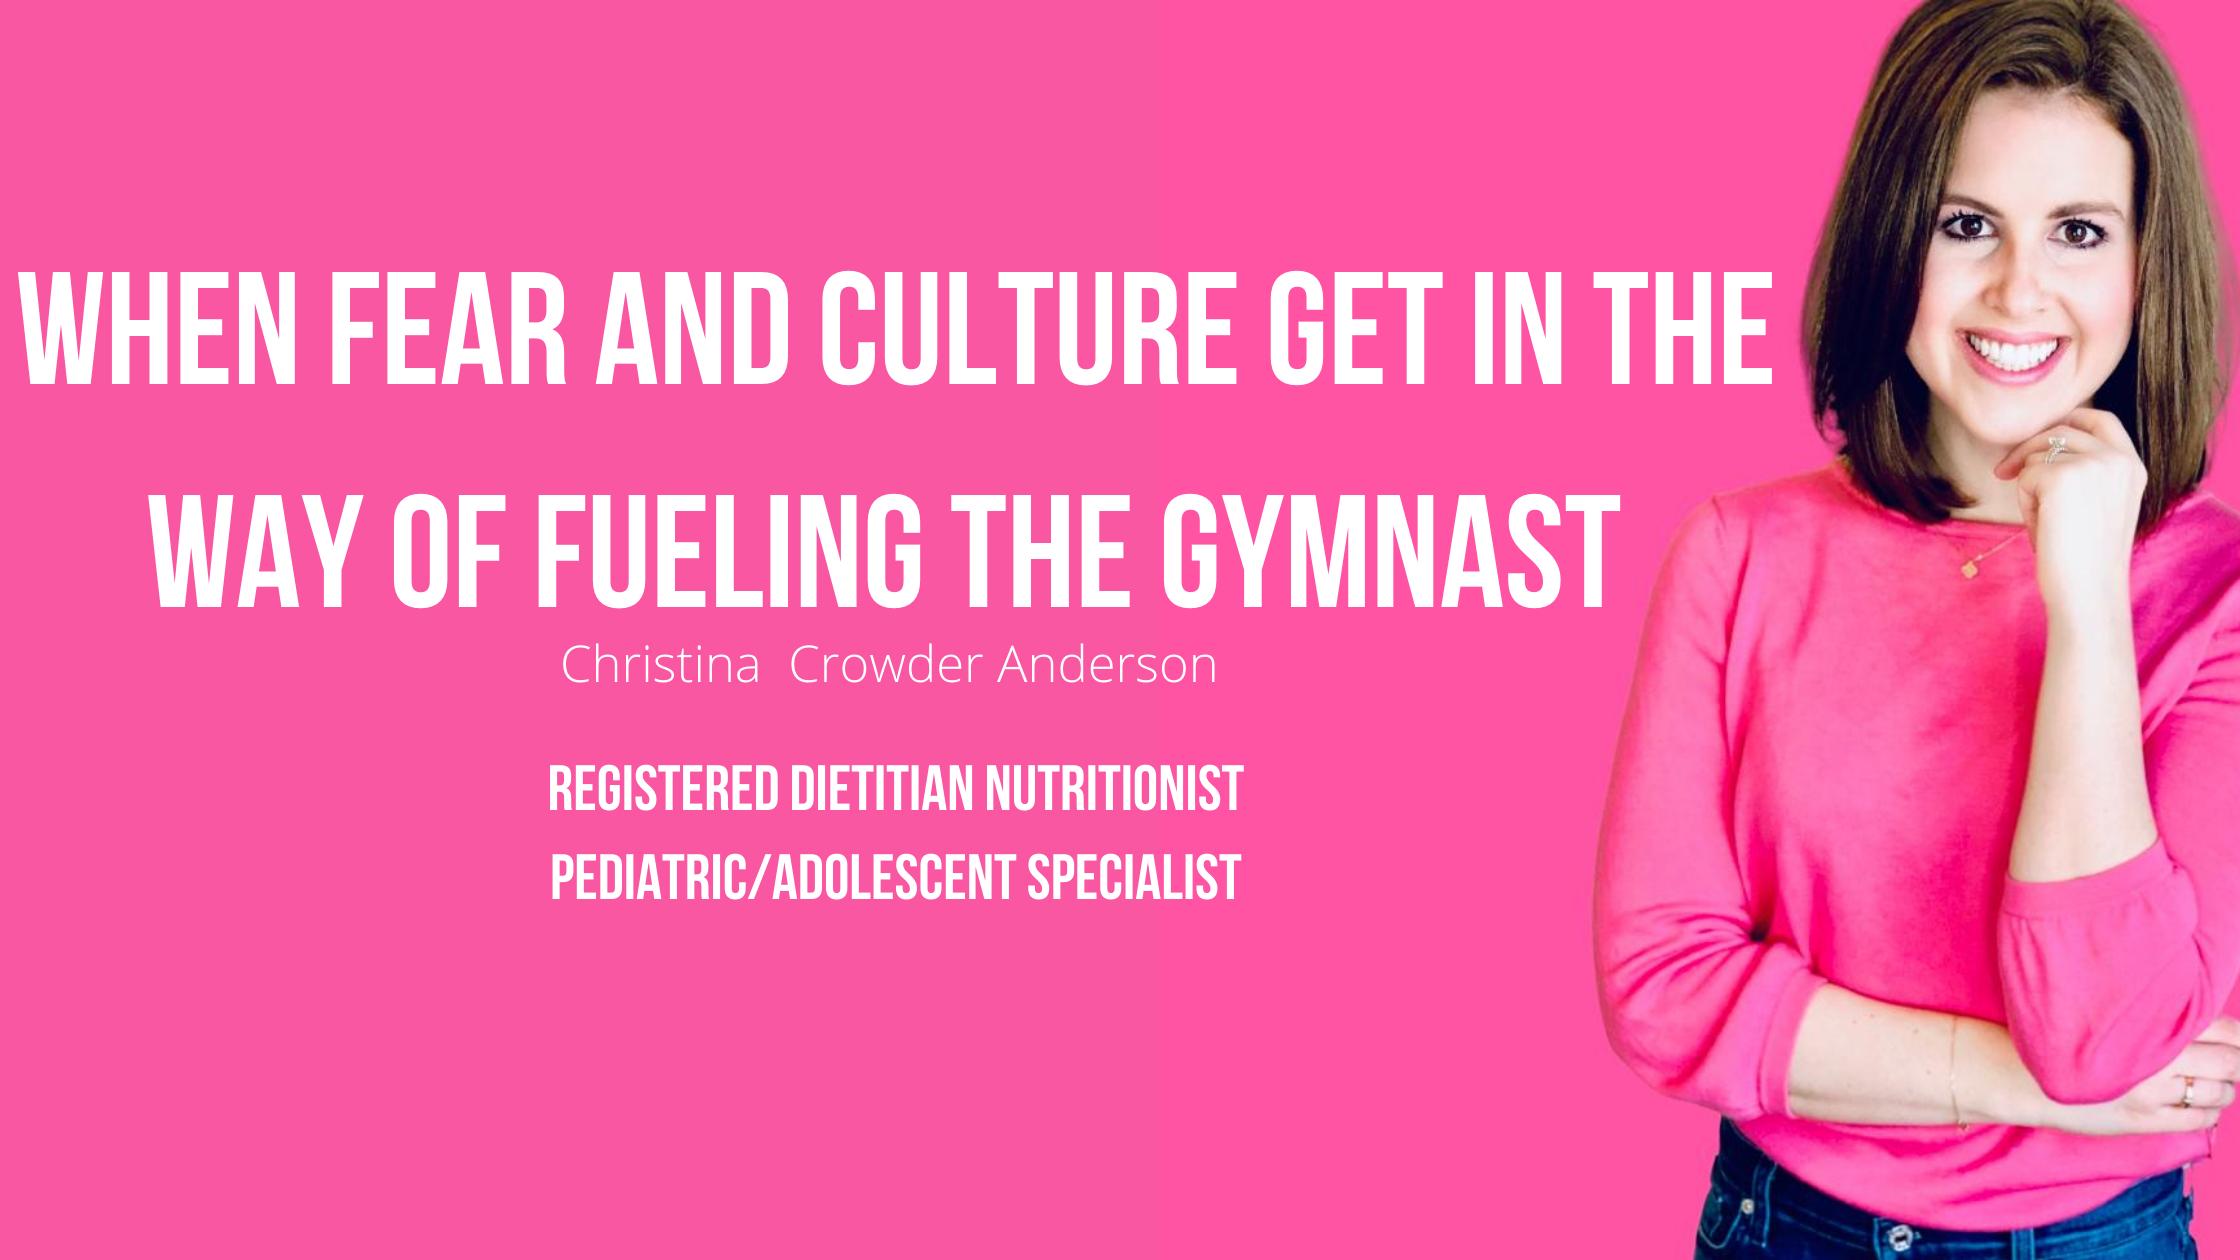 Gymnast Nutrition Culture